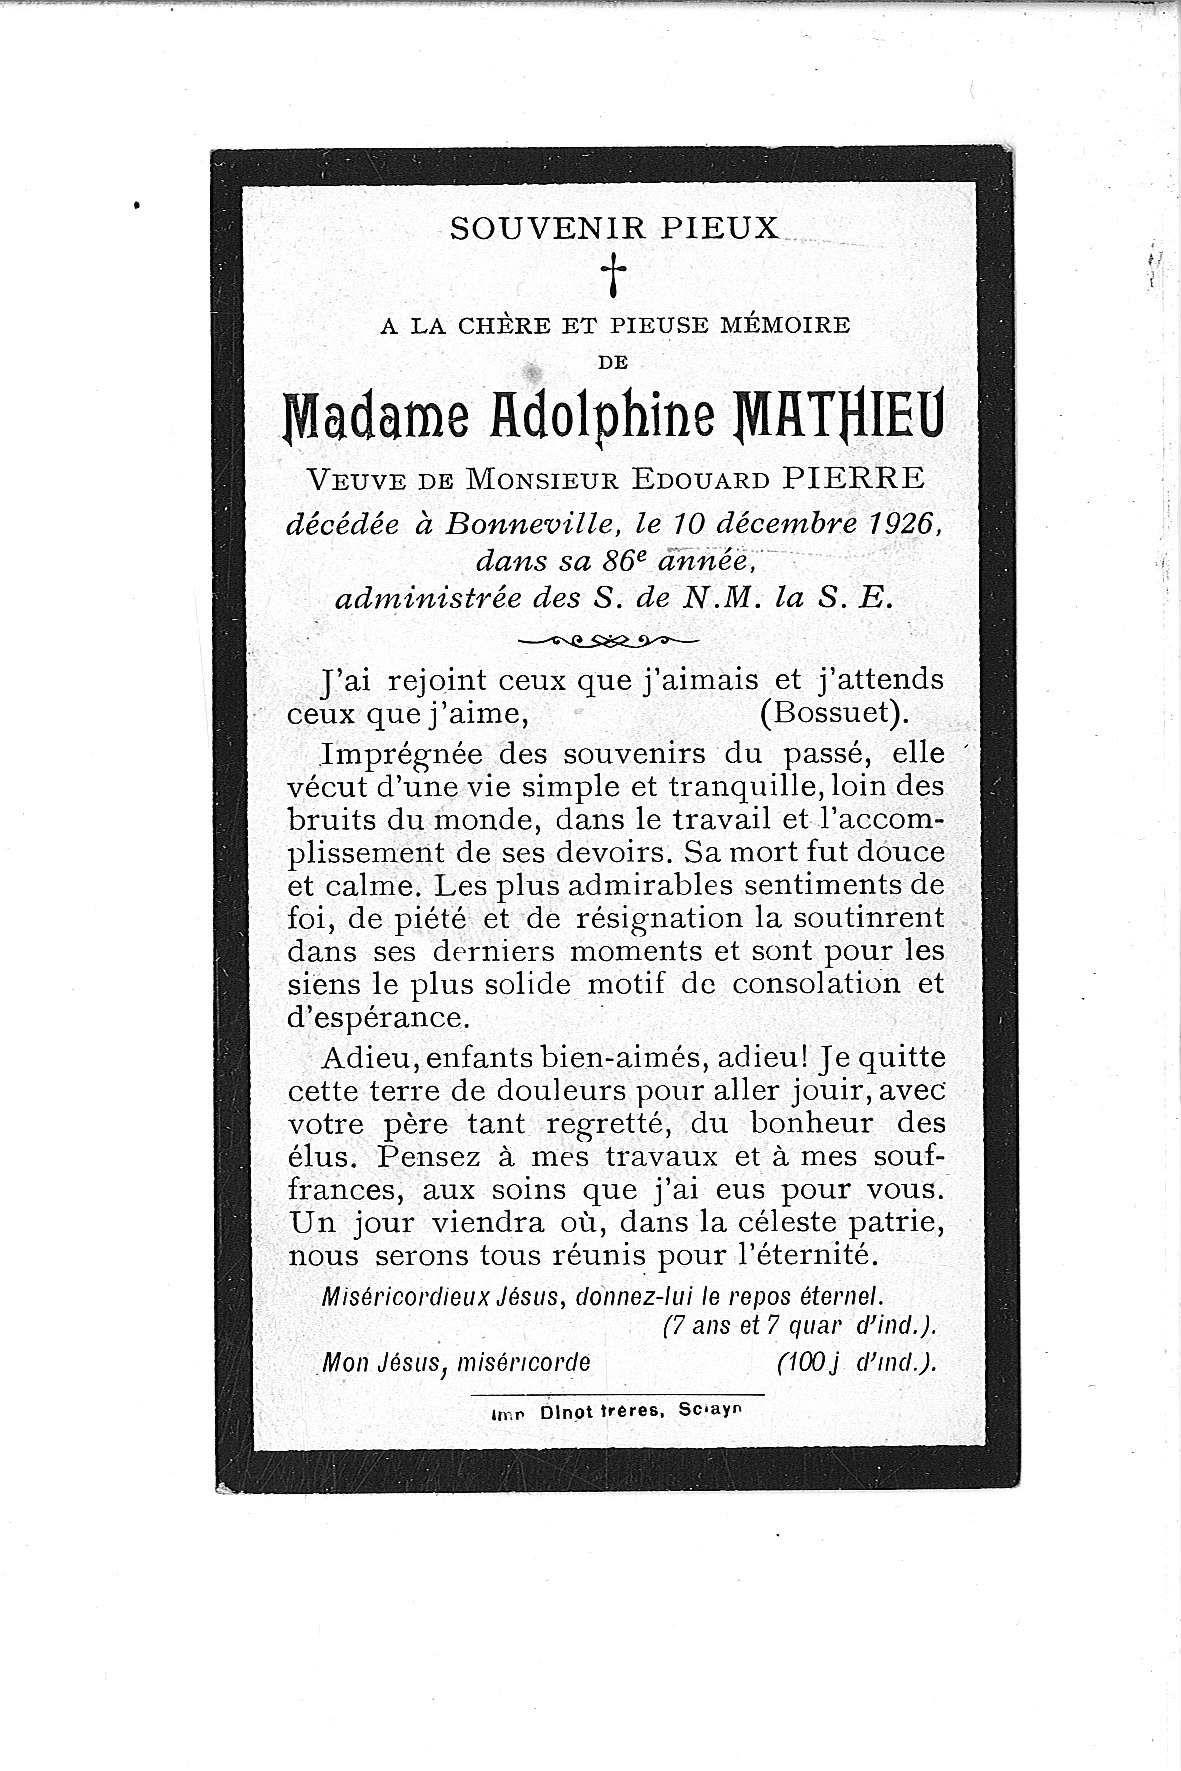 Adolphine(1926)20120227121116_00006.jpg